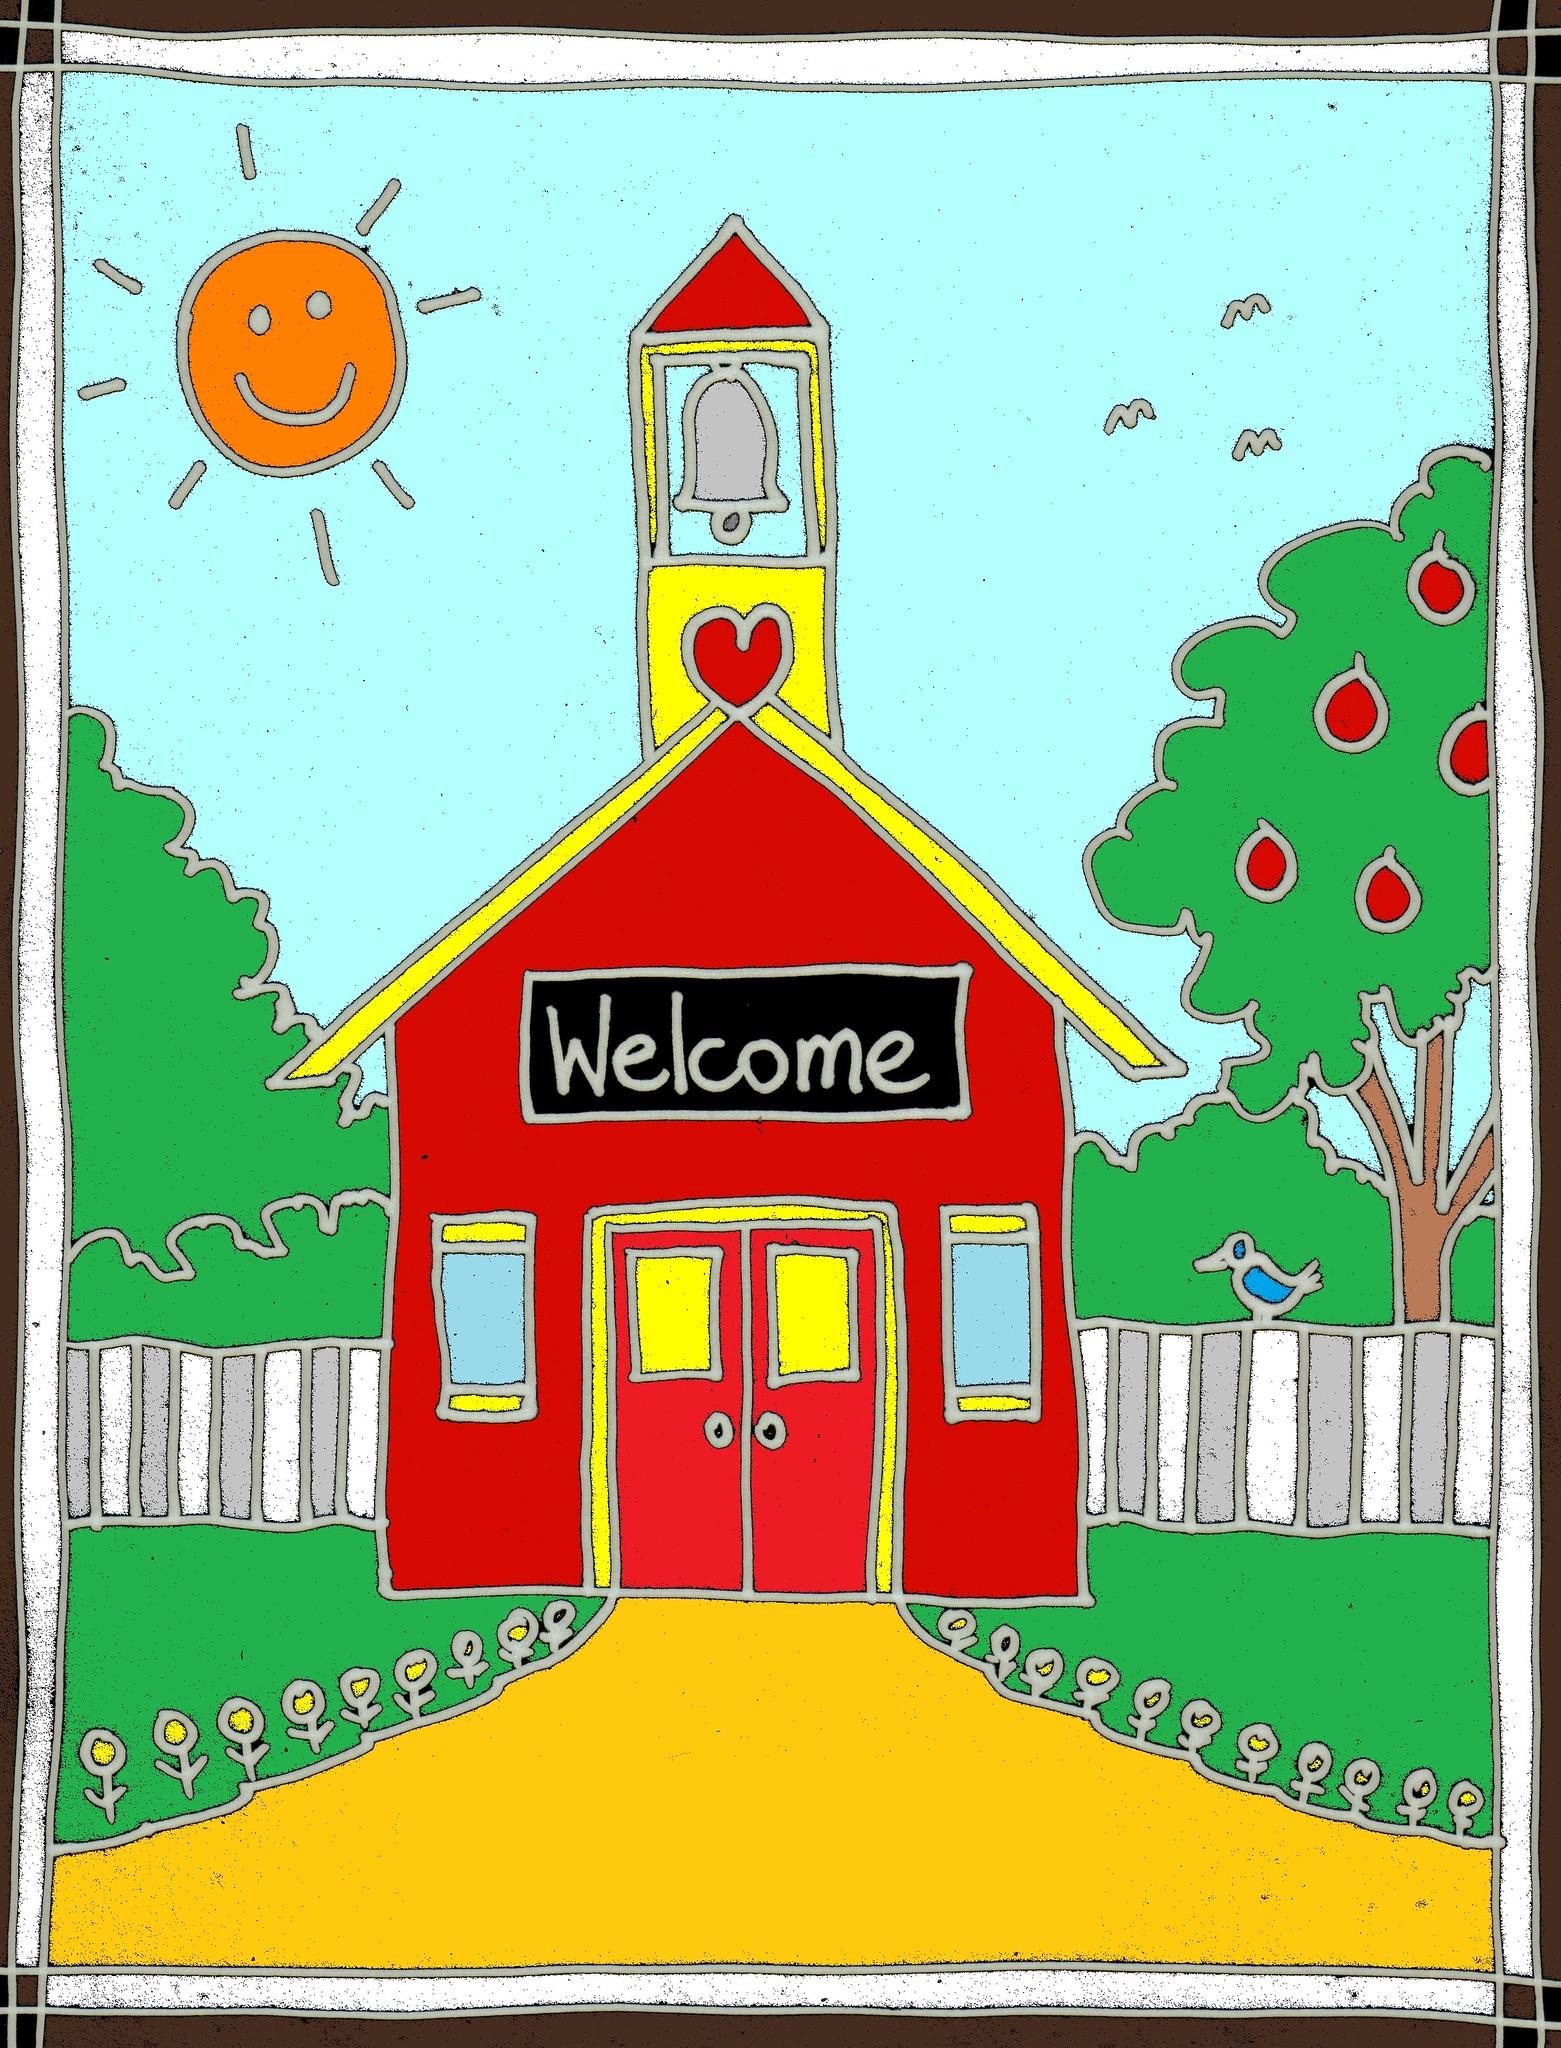 Teacher Clip art: Red schoolhouse by Stushie – Stushie Art